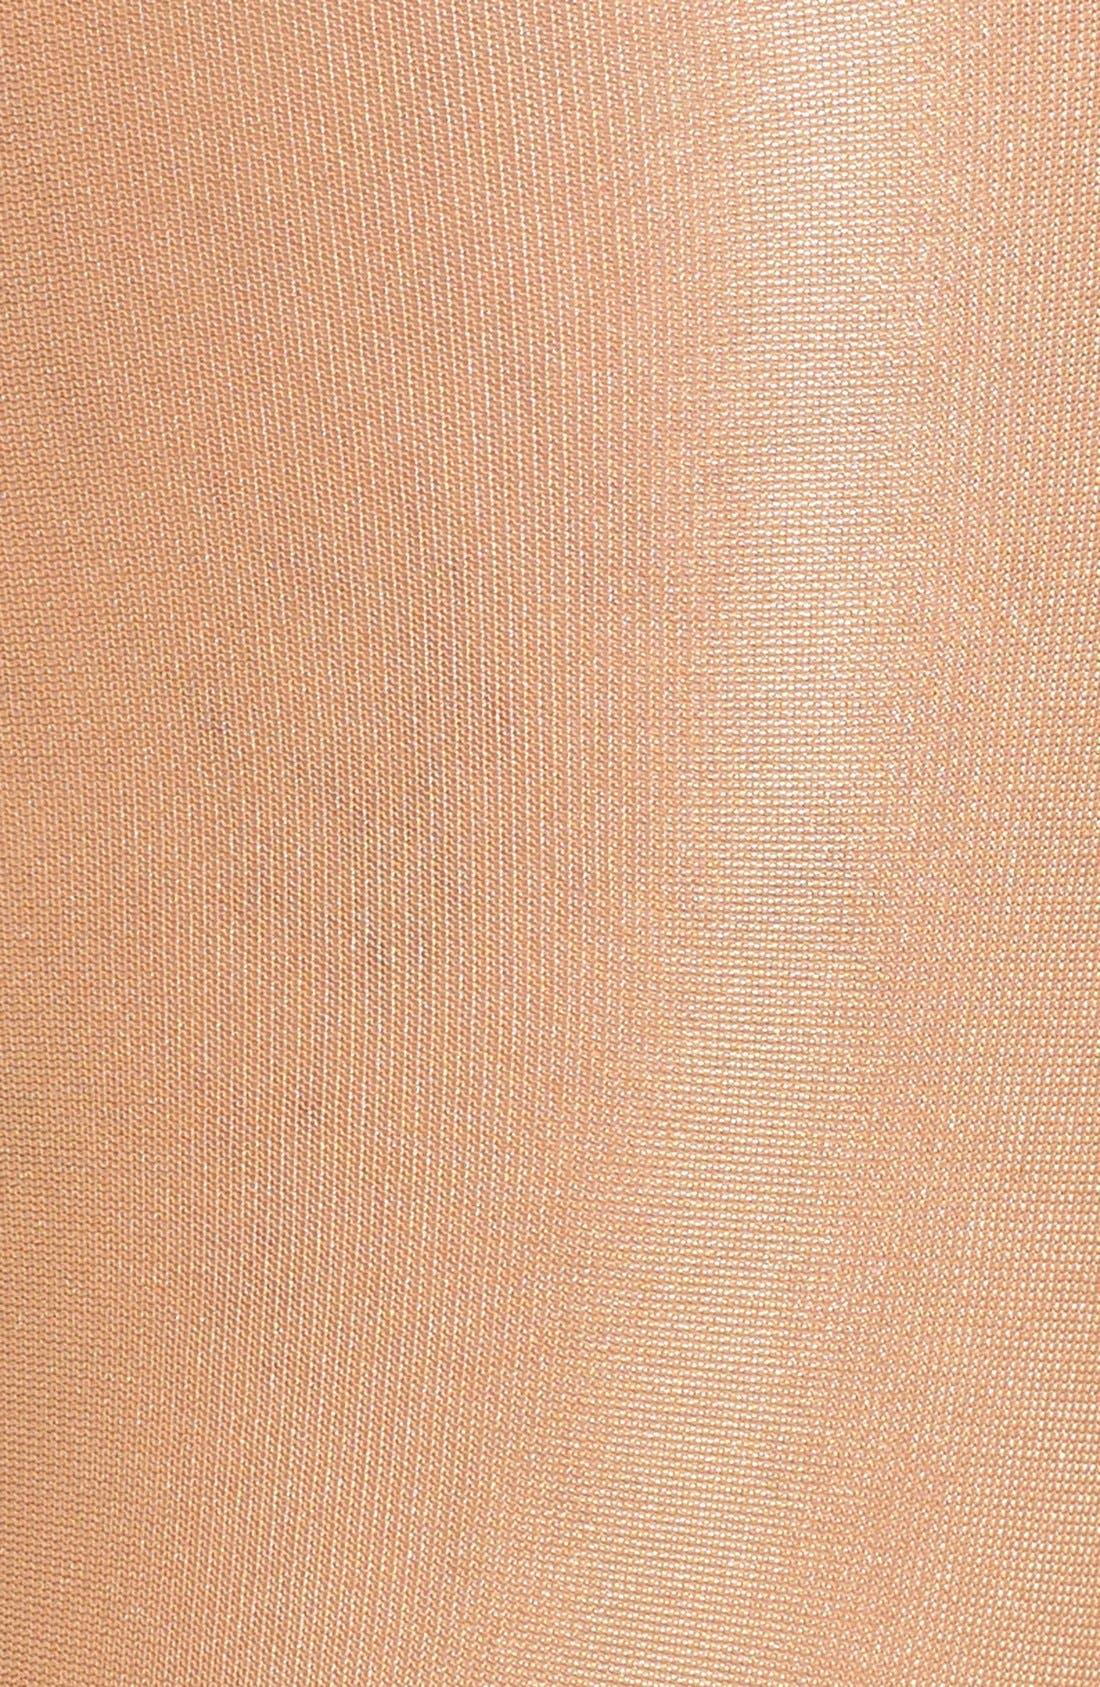 Alternate Image 3  - Wolford 'Neon 40' Pantyhose